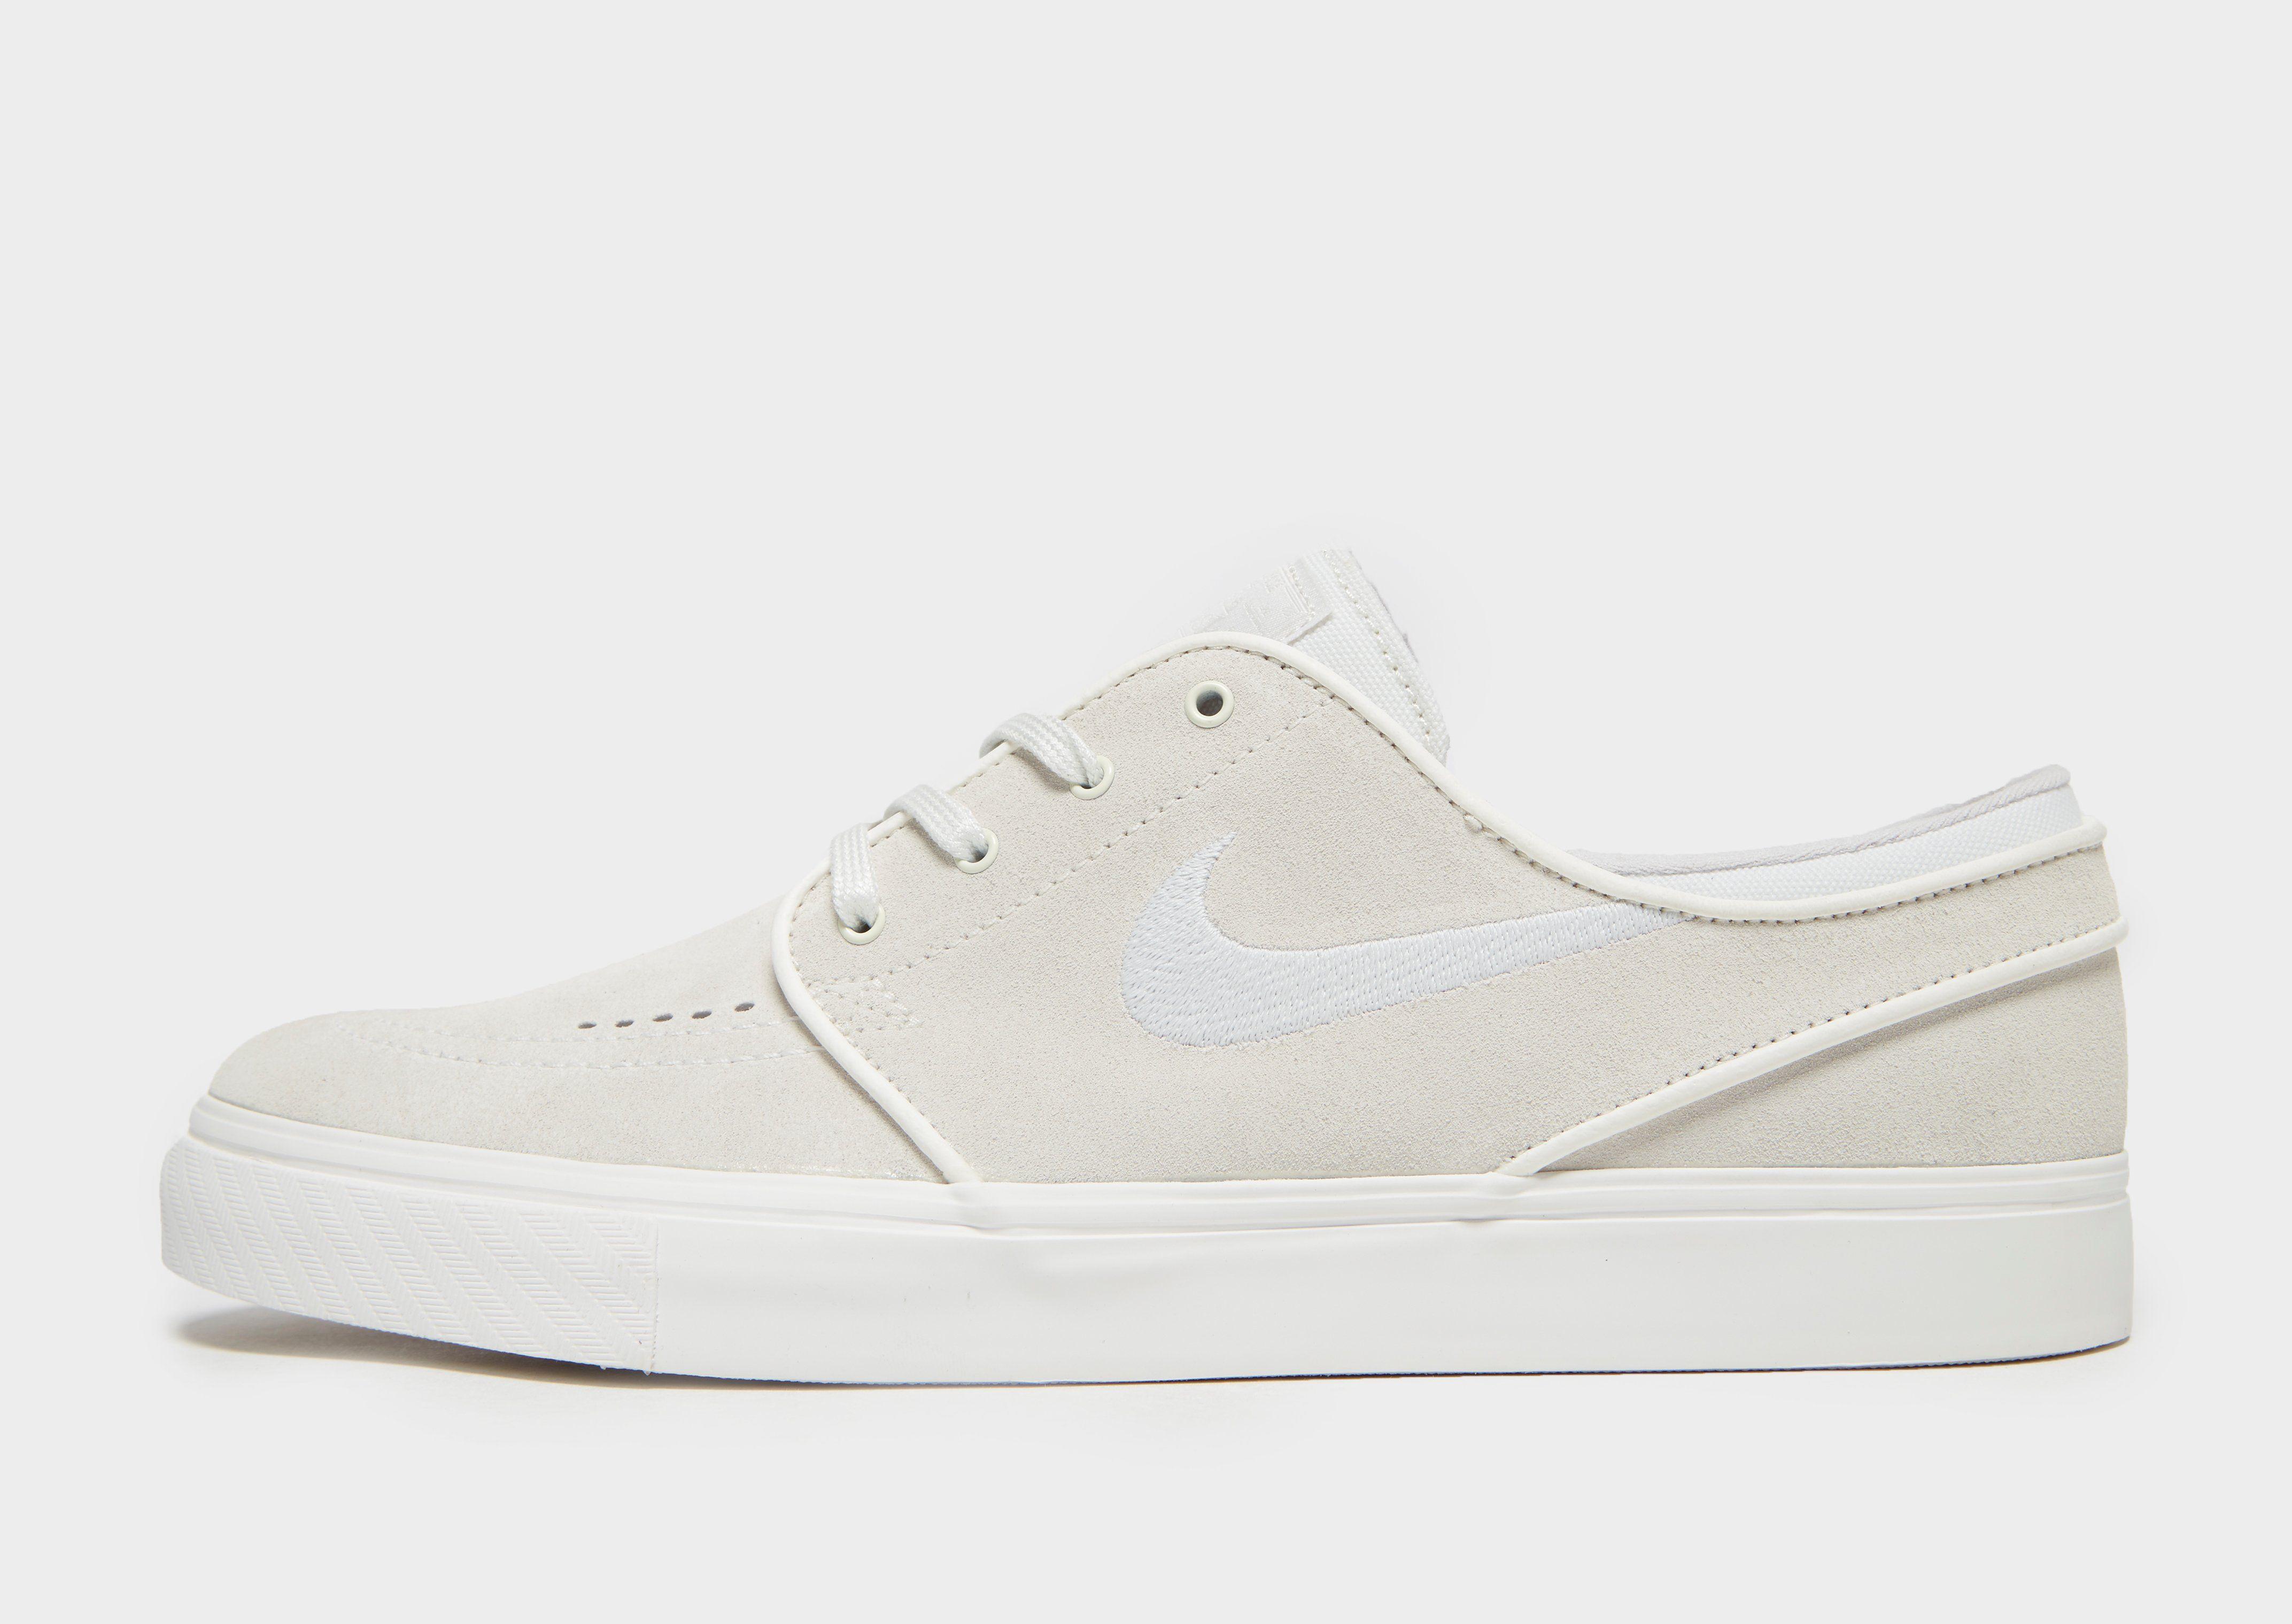 NIKE Nike Zoom Stefan Janoski Men s Skate Shoe  7c1e4db3dd